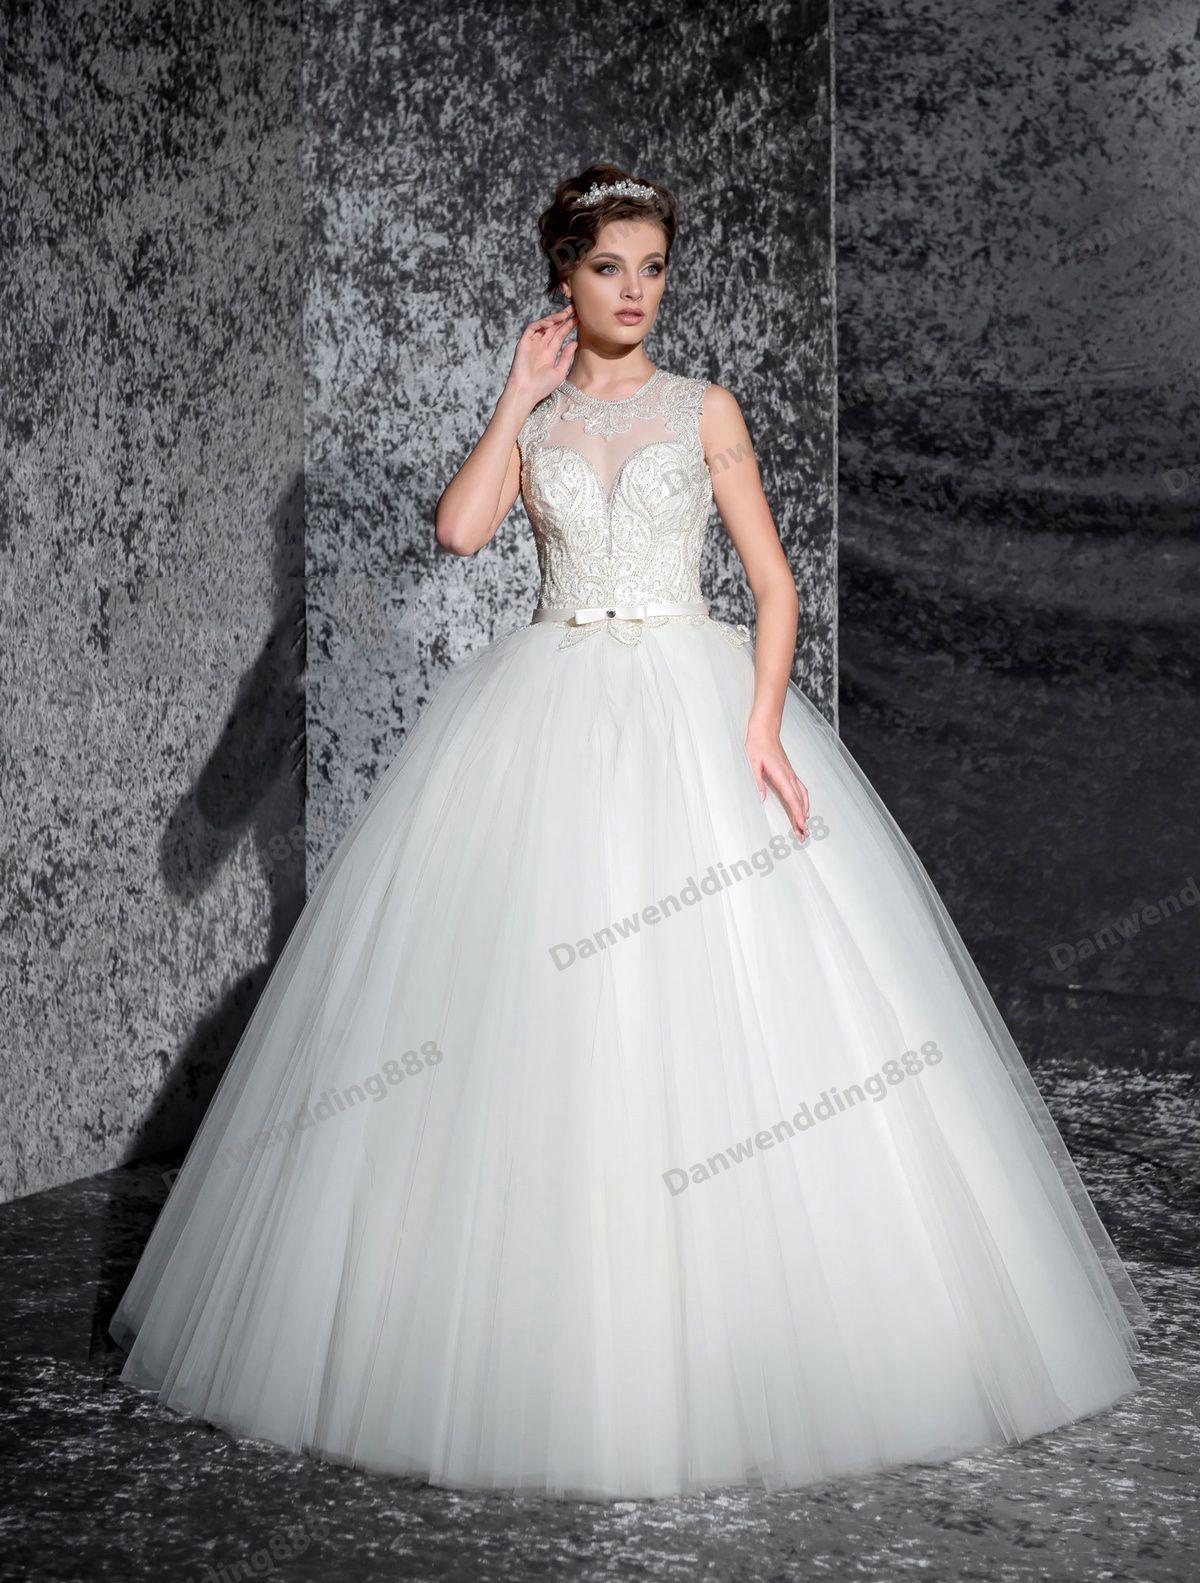 e15167591b64e Cheap Rachel Allan Two Piece Dresses Discount New Stylish Dress Pictures